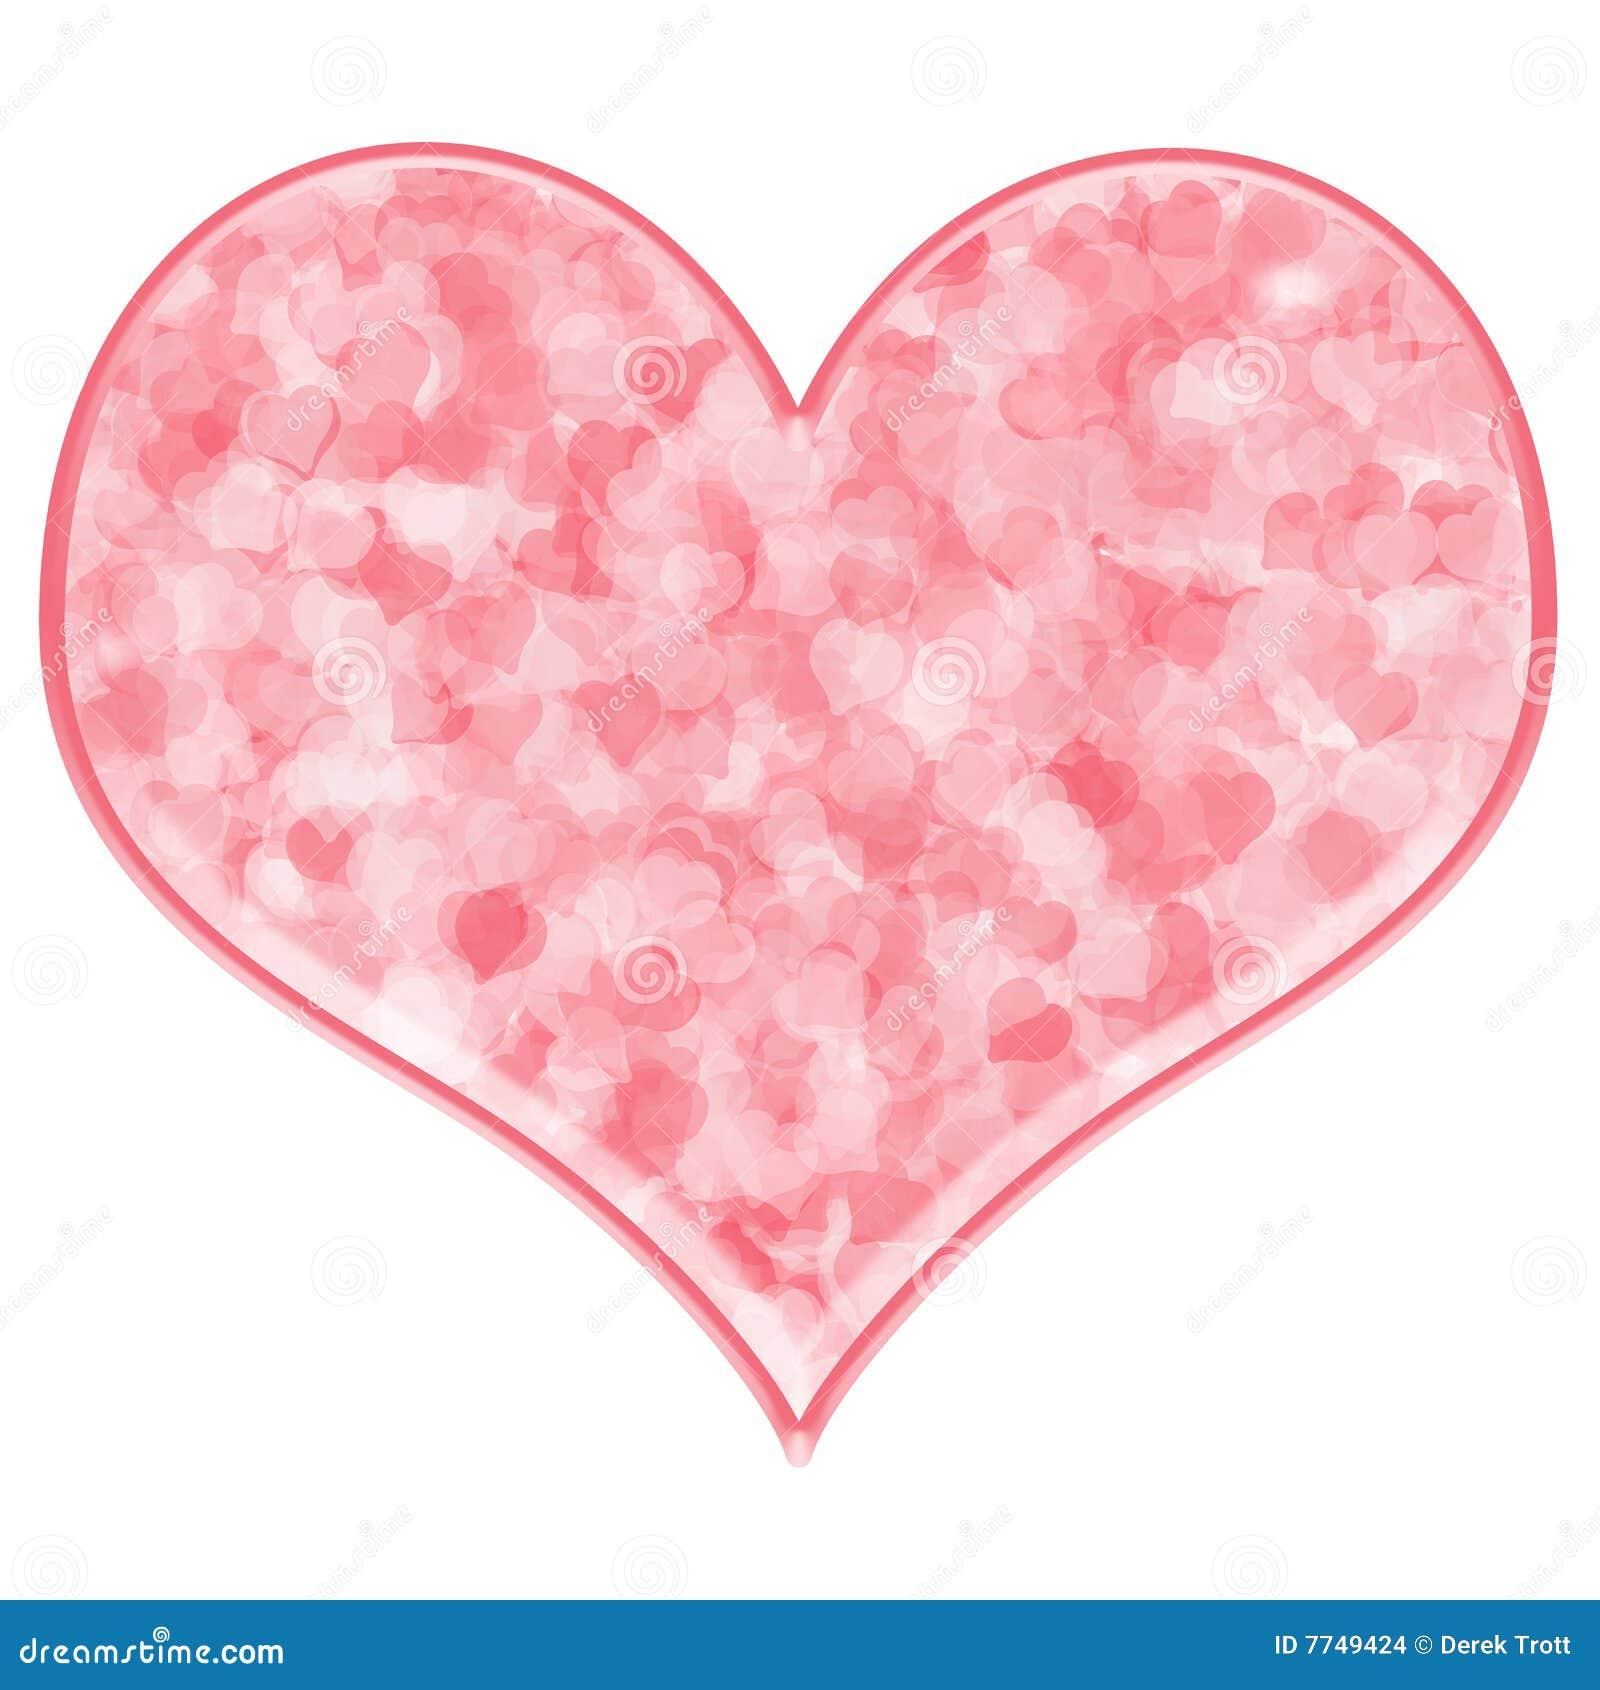 pink heart stock illustration illustration of passion 7749424 rh dreamstime com big pink heart images pink heart pictures